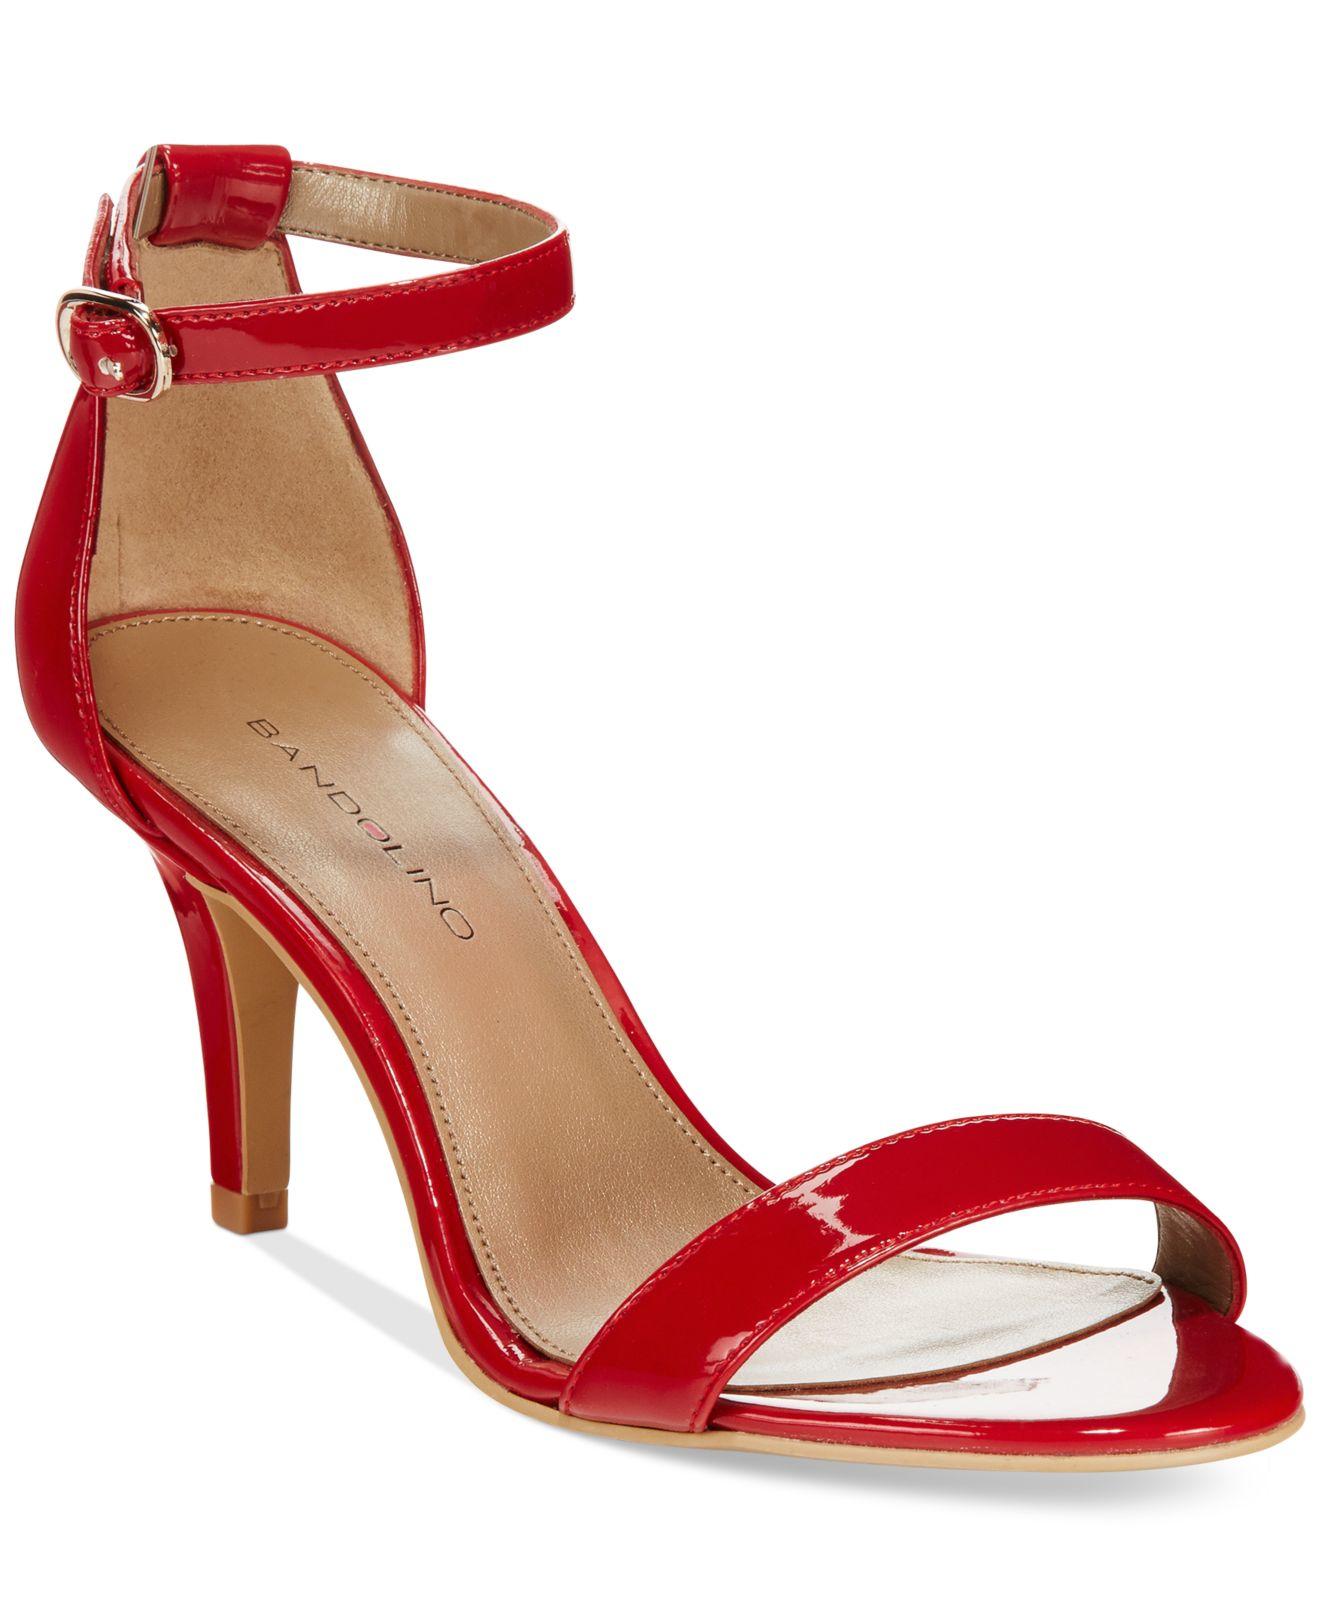 1c83e078e8b Lyst - Bandolino Madia Dress Sandals in Red